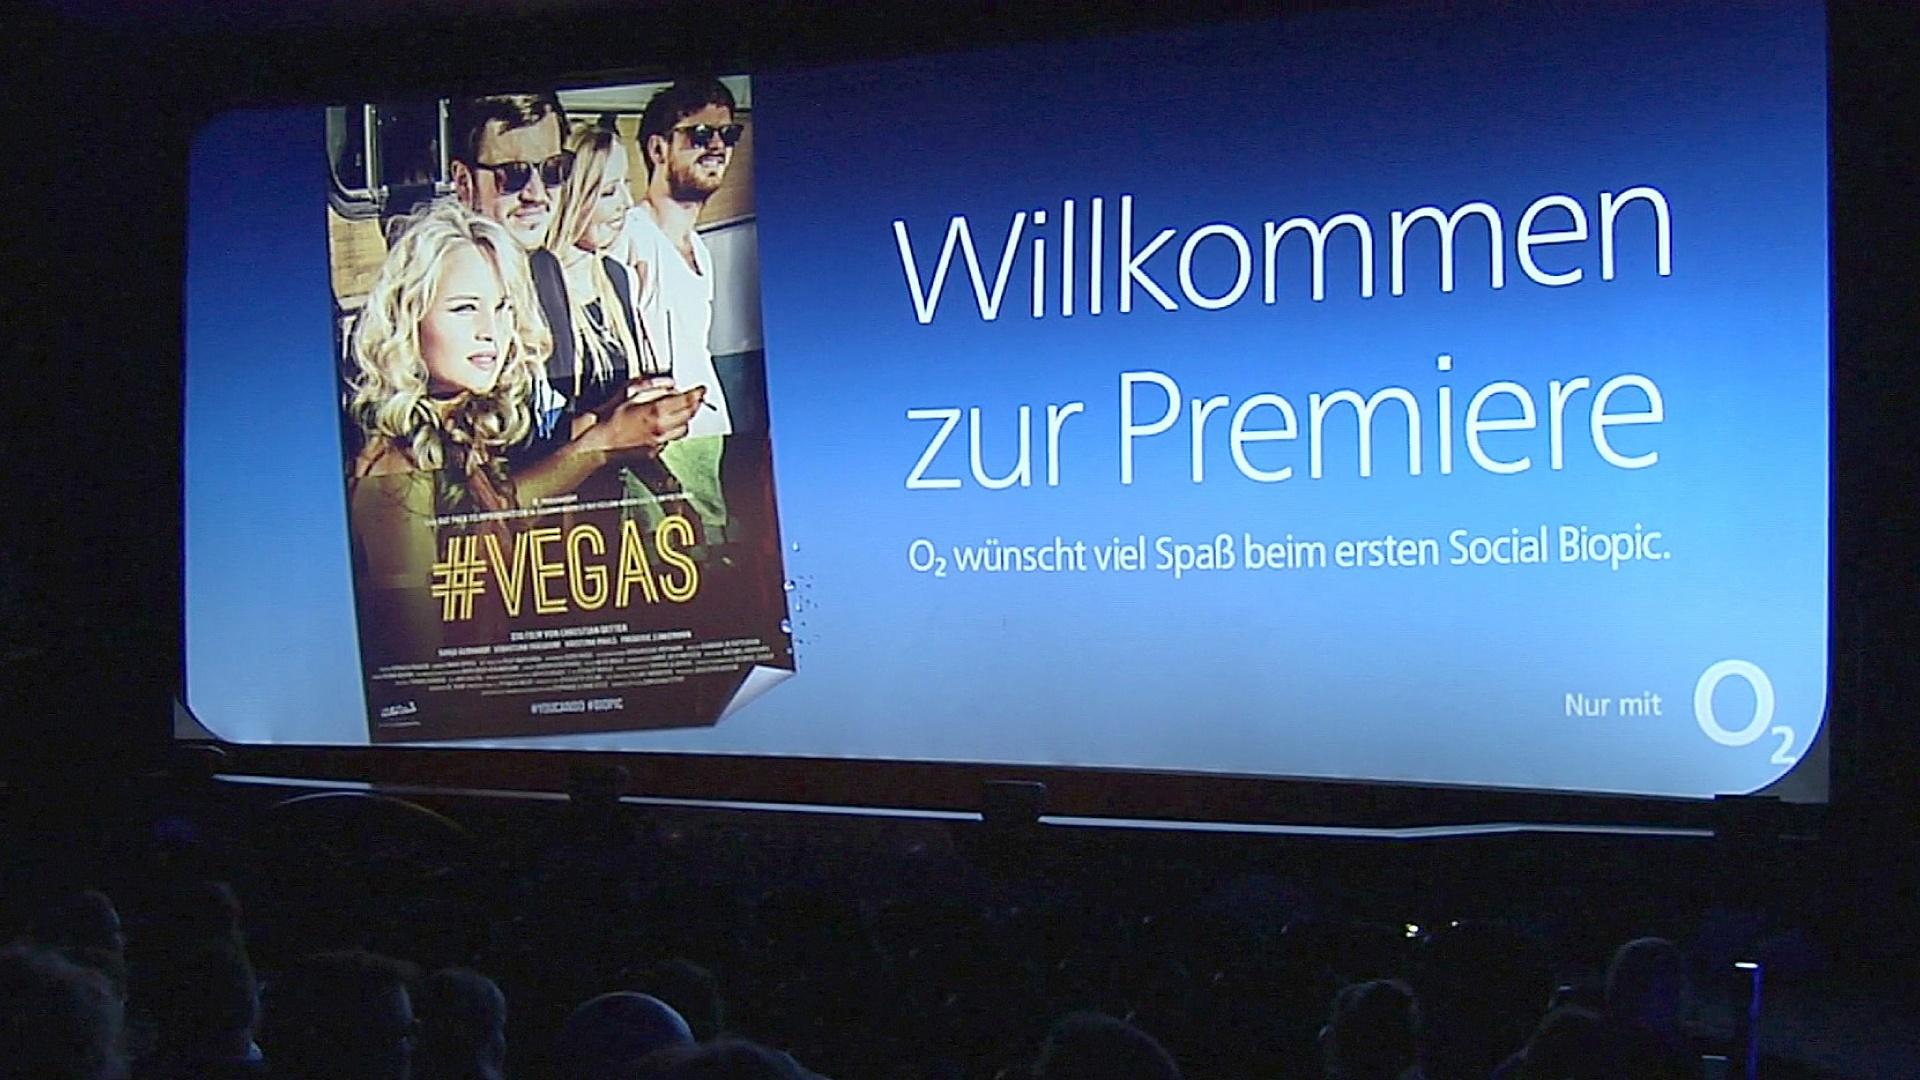 Keyvisual o2 #YouCanDo #Biopic